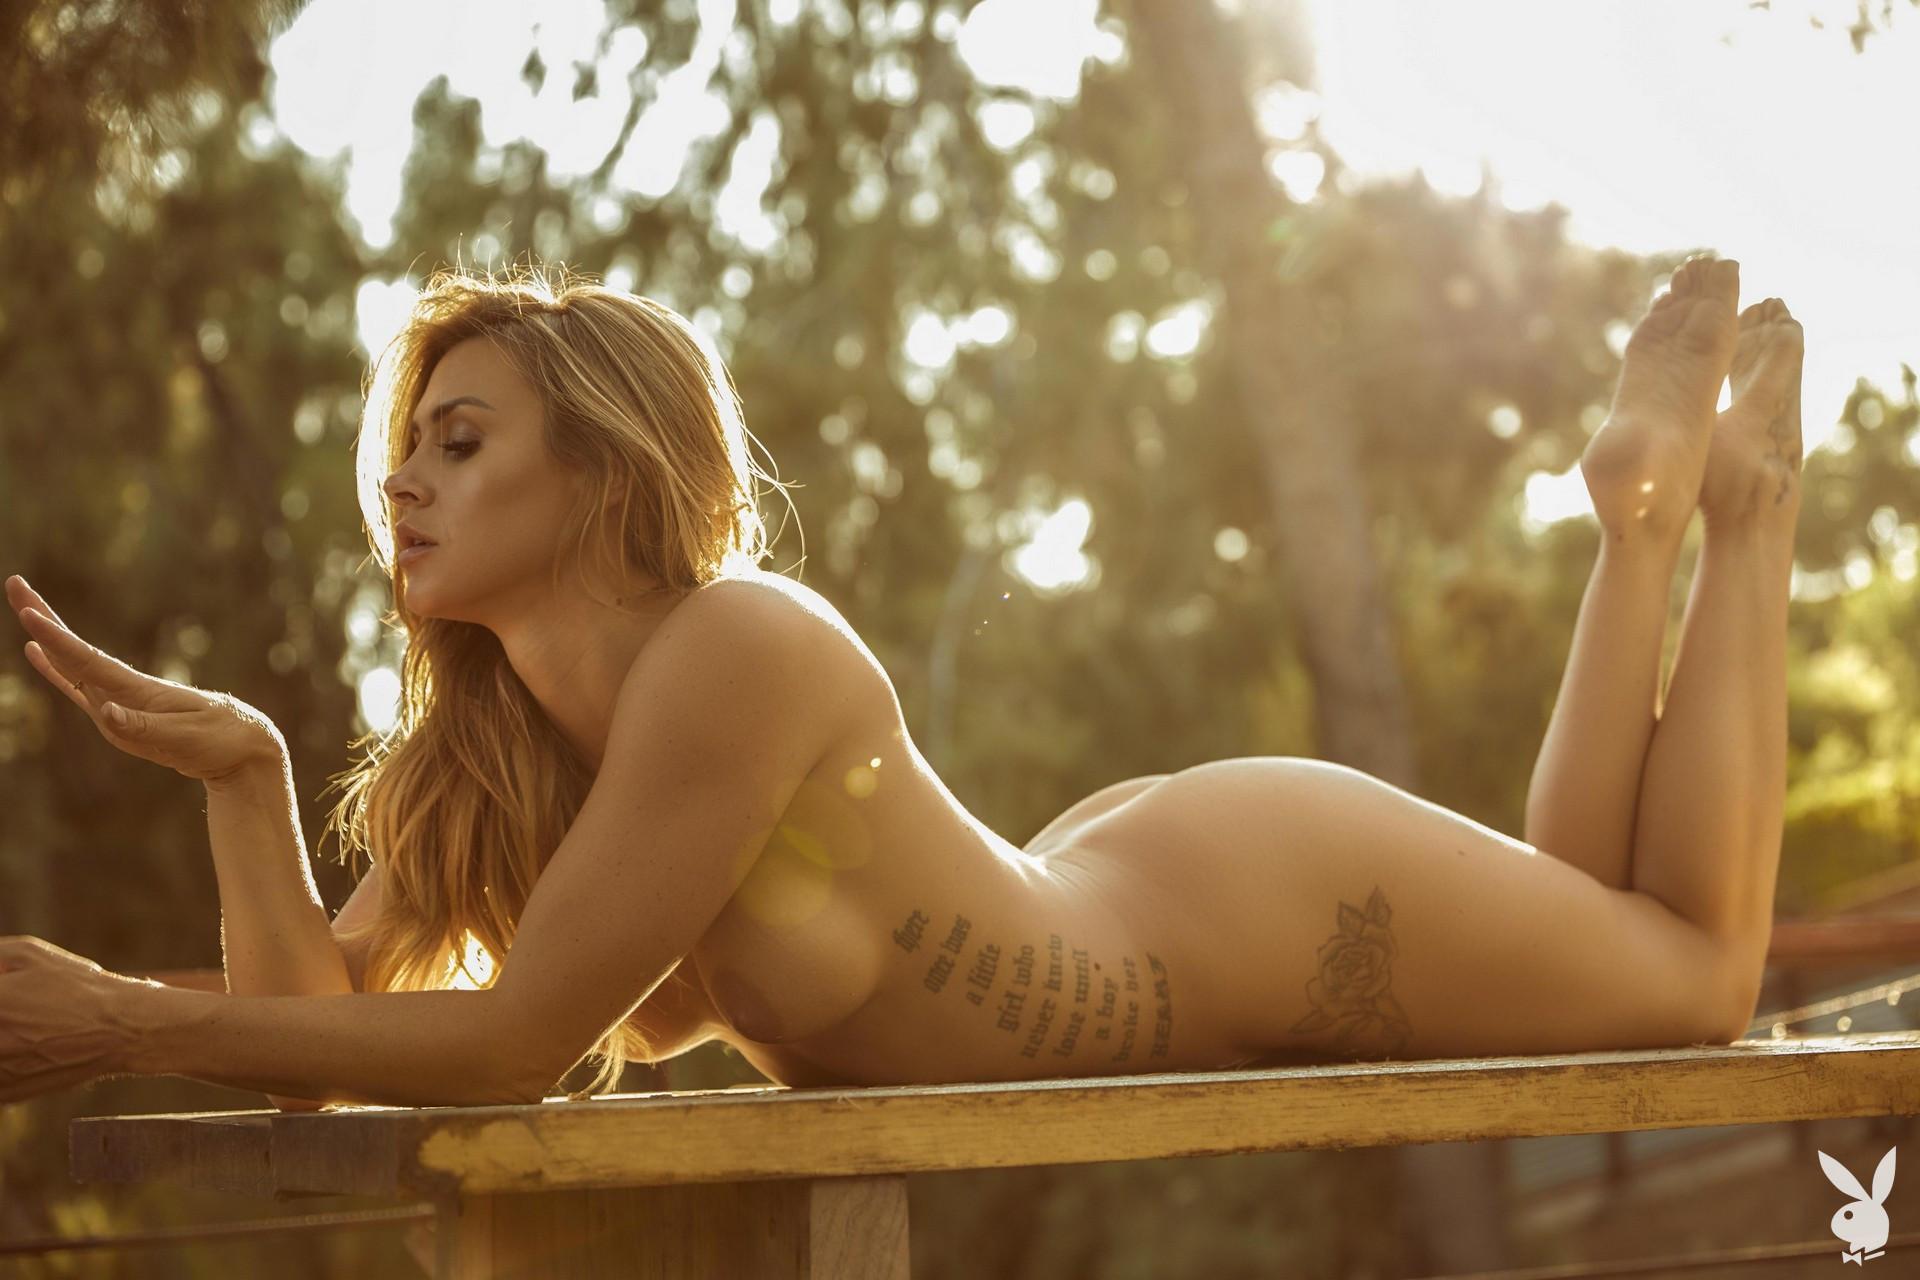 Ella Silver - Playboy photoshoot